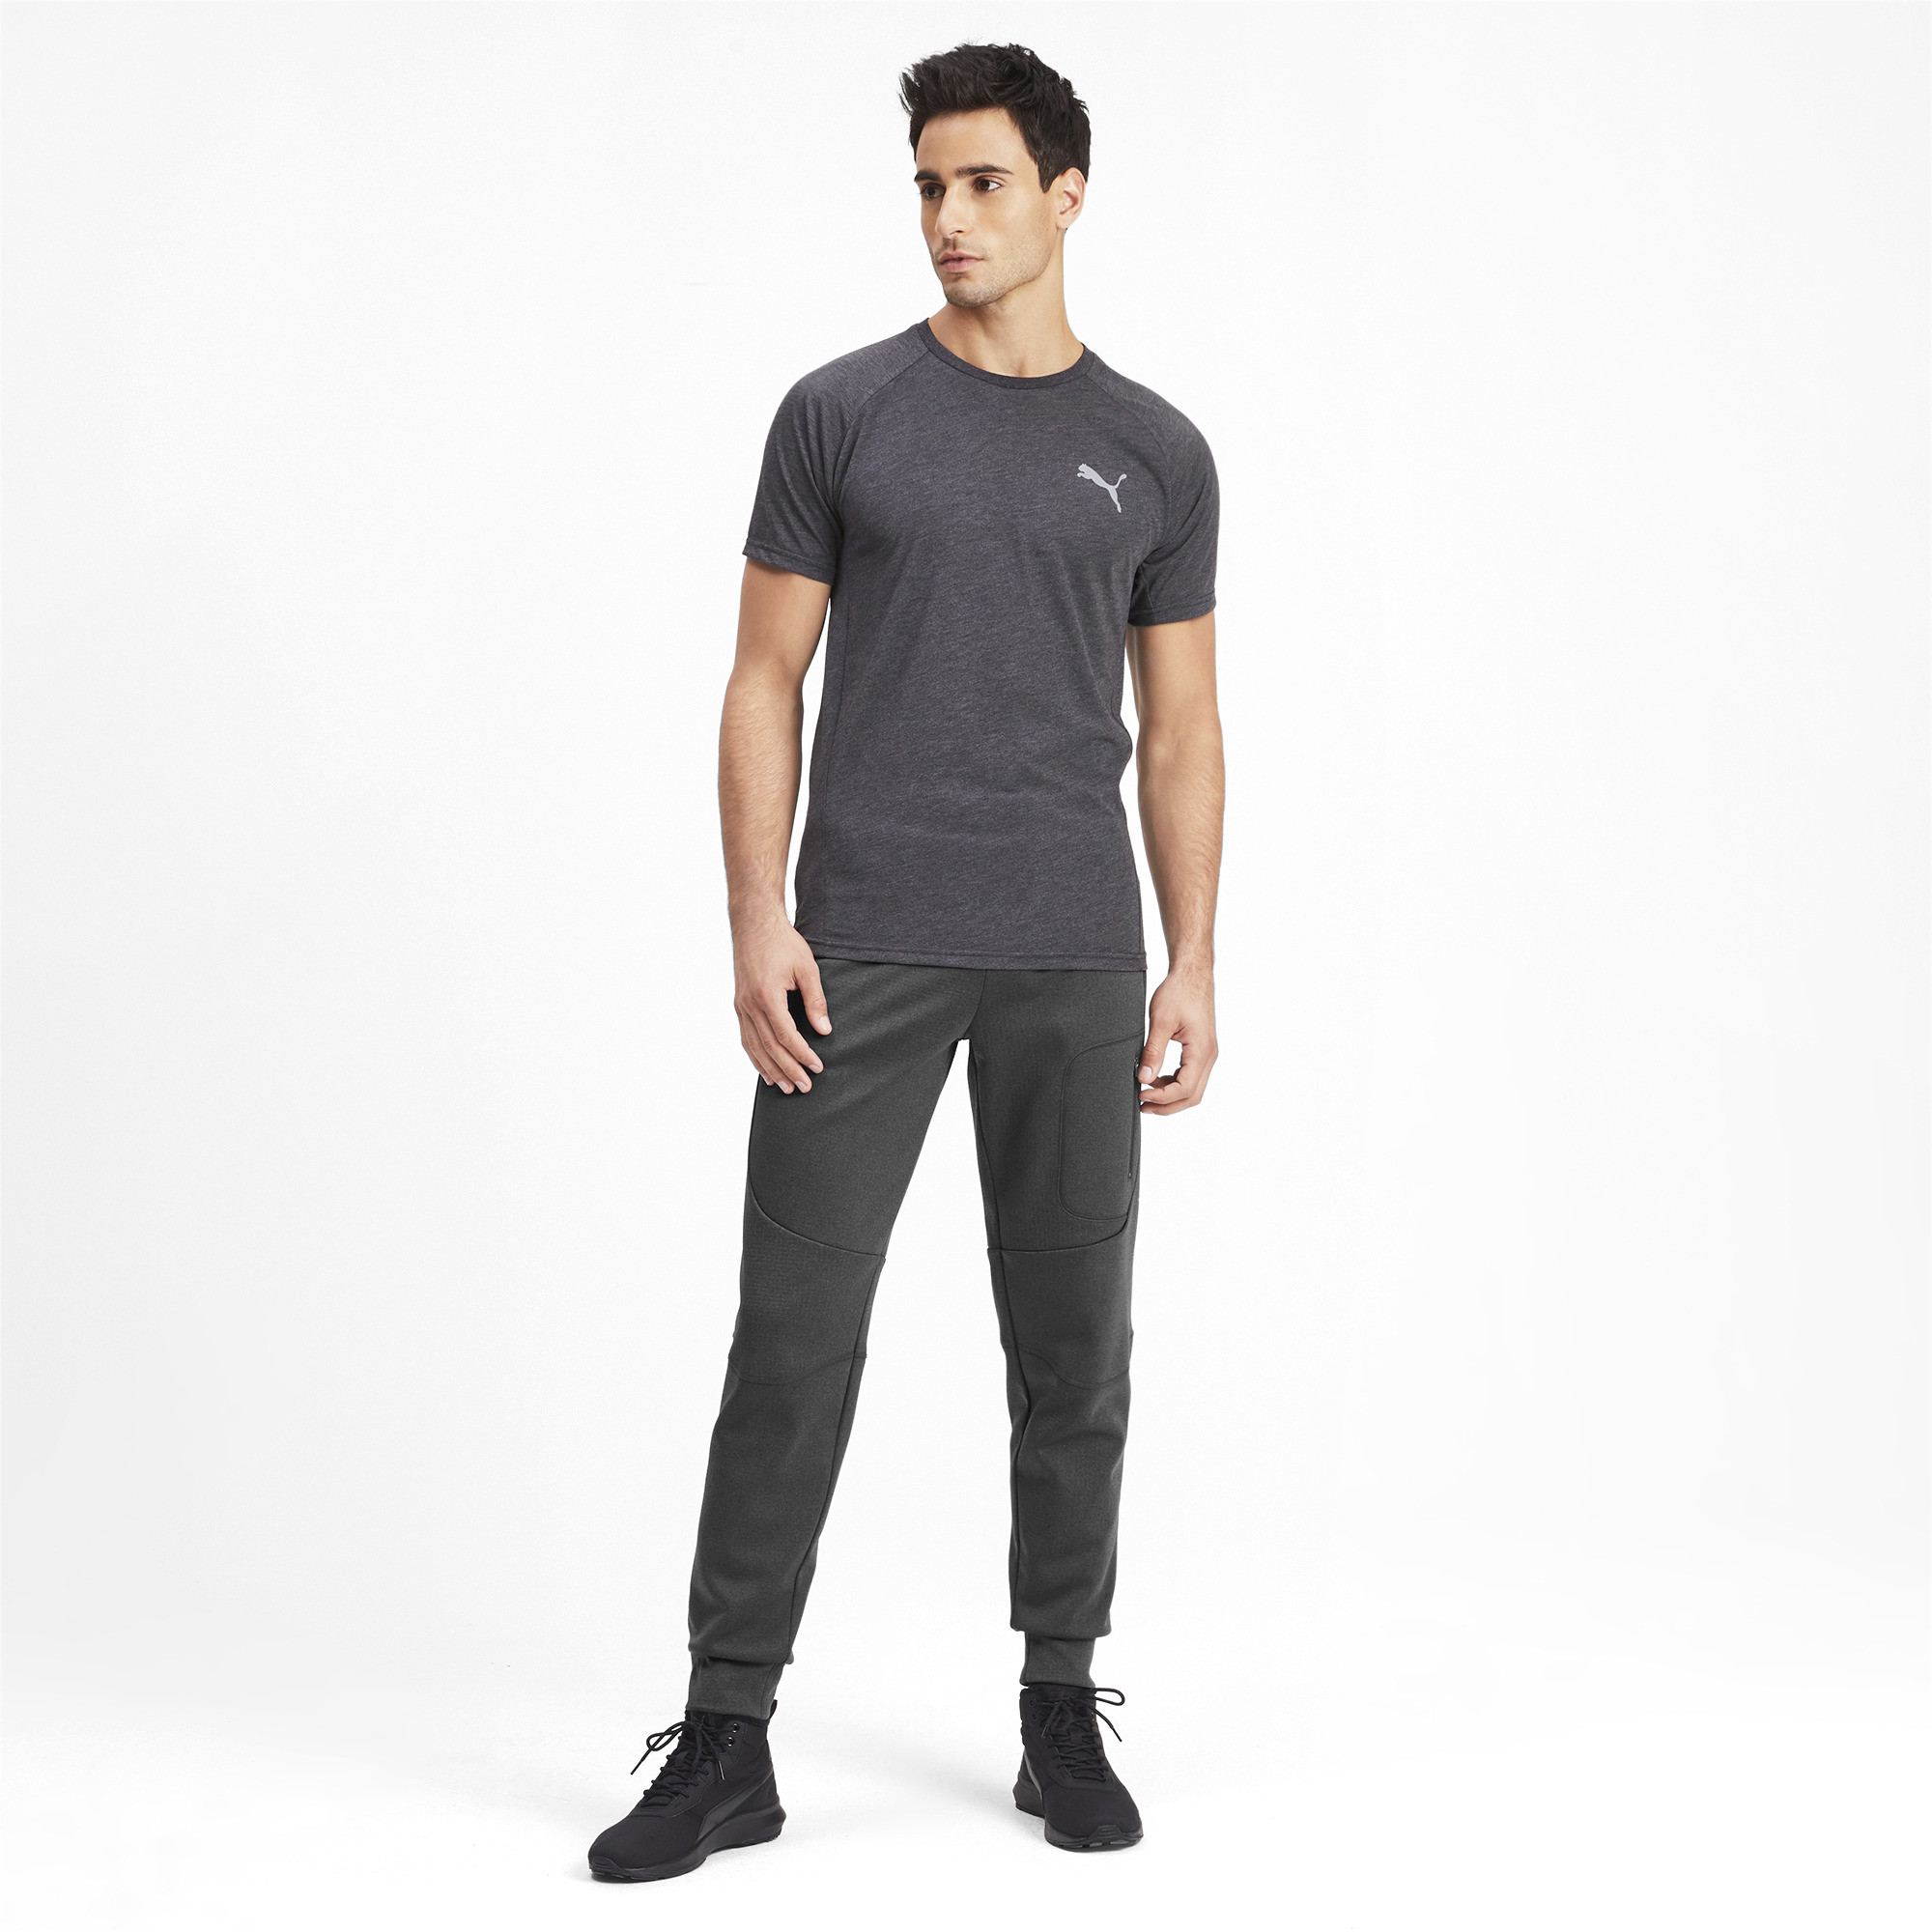 PUMA-Evostripe-Warm-Men-039-s-Pants-Men-Knitted-Pants-Basics miniatura 6